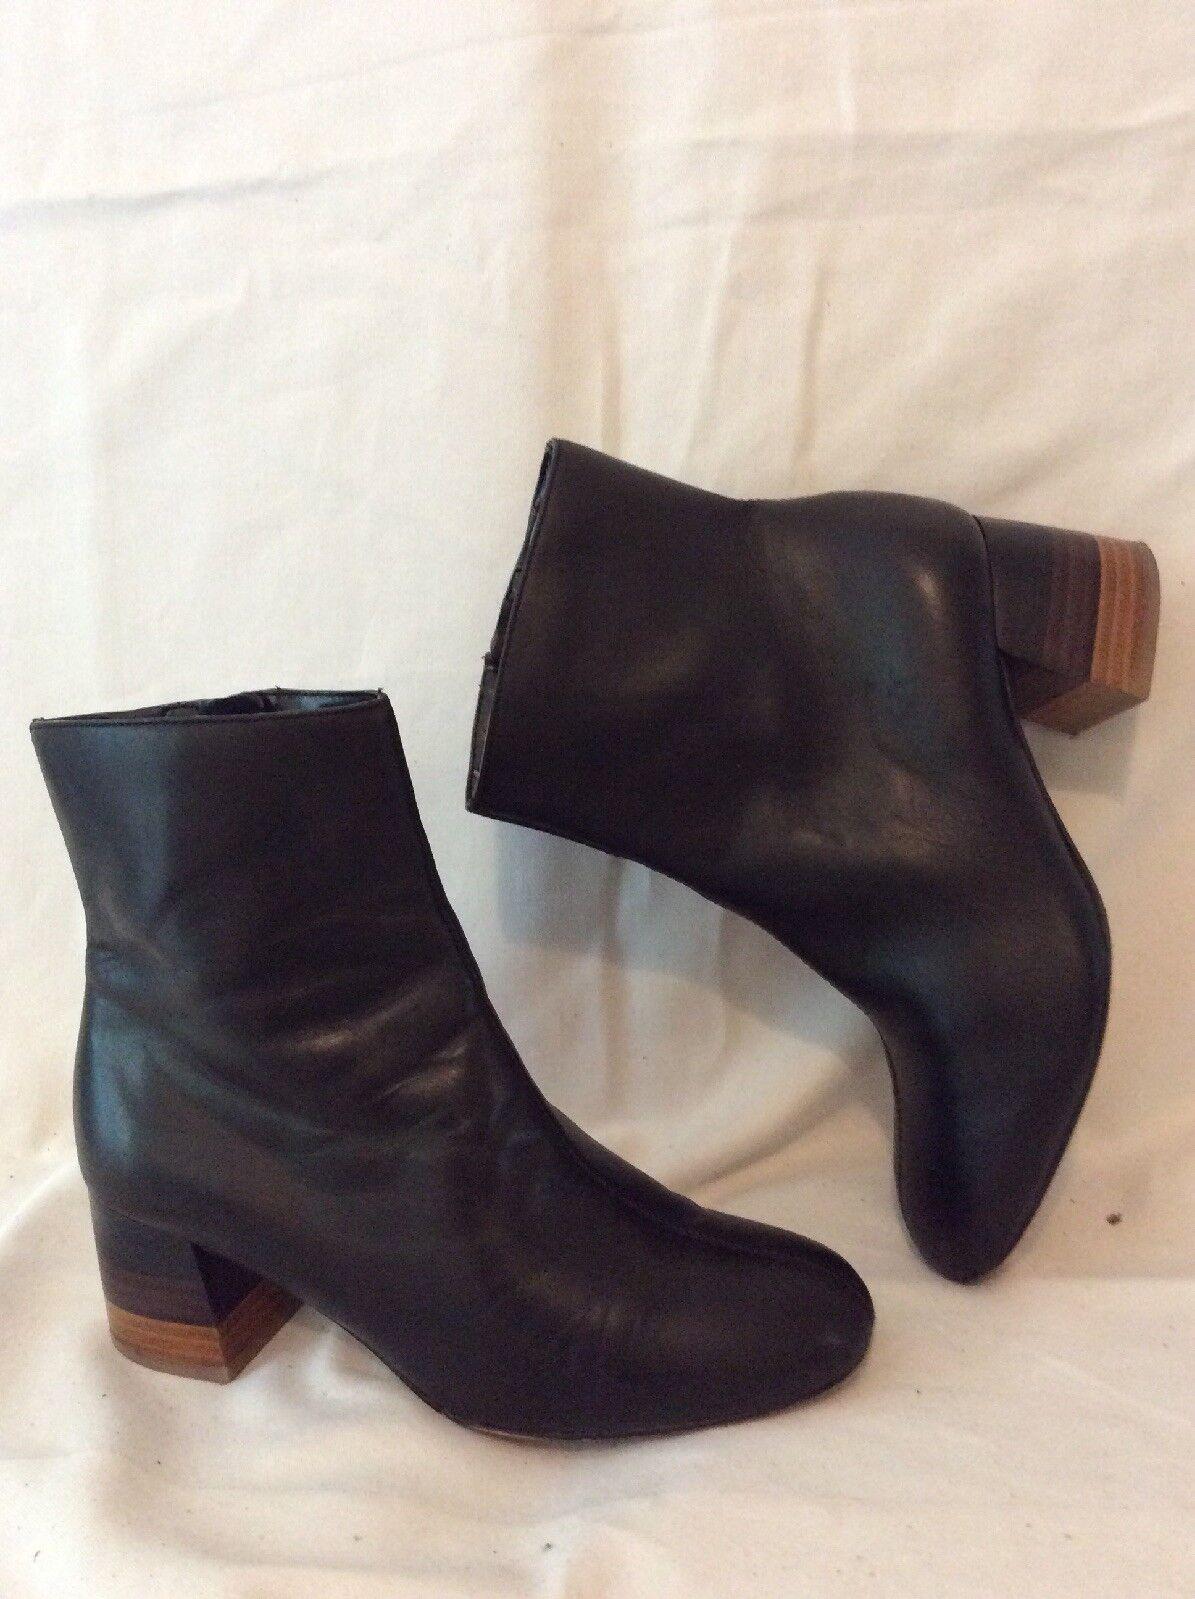 5af659bc503 Autograph Black Ankle Boots Size 4.5 Leather ntbepj1819-Women s Boots